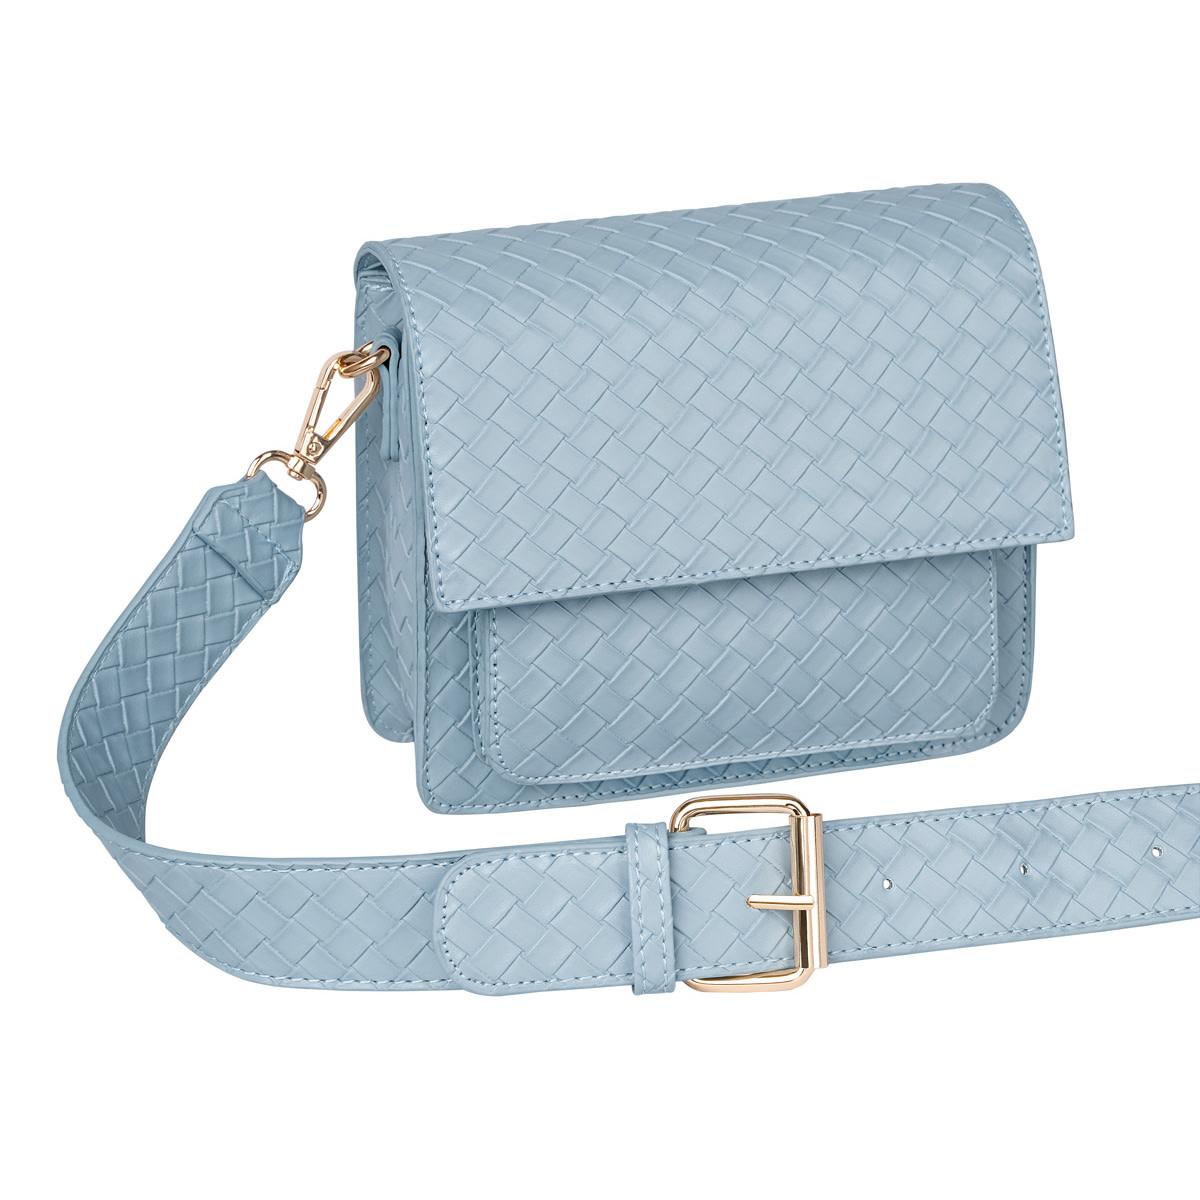 With love Bag braided  Blue 18cm x 15cm